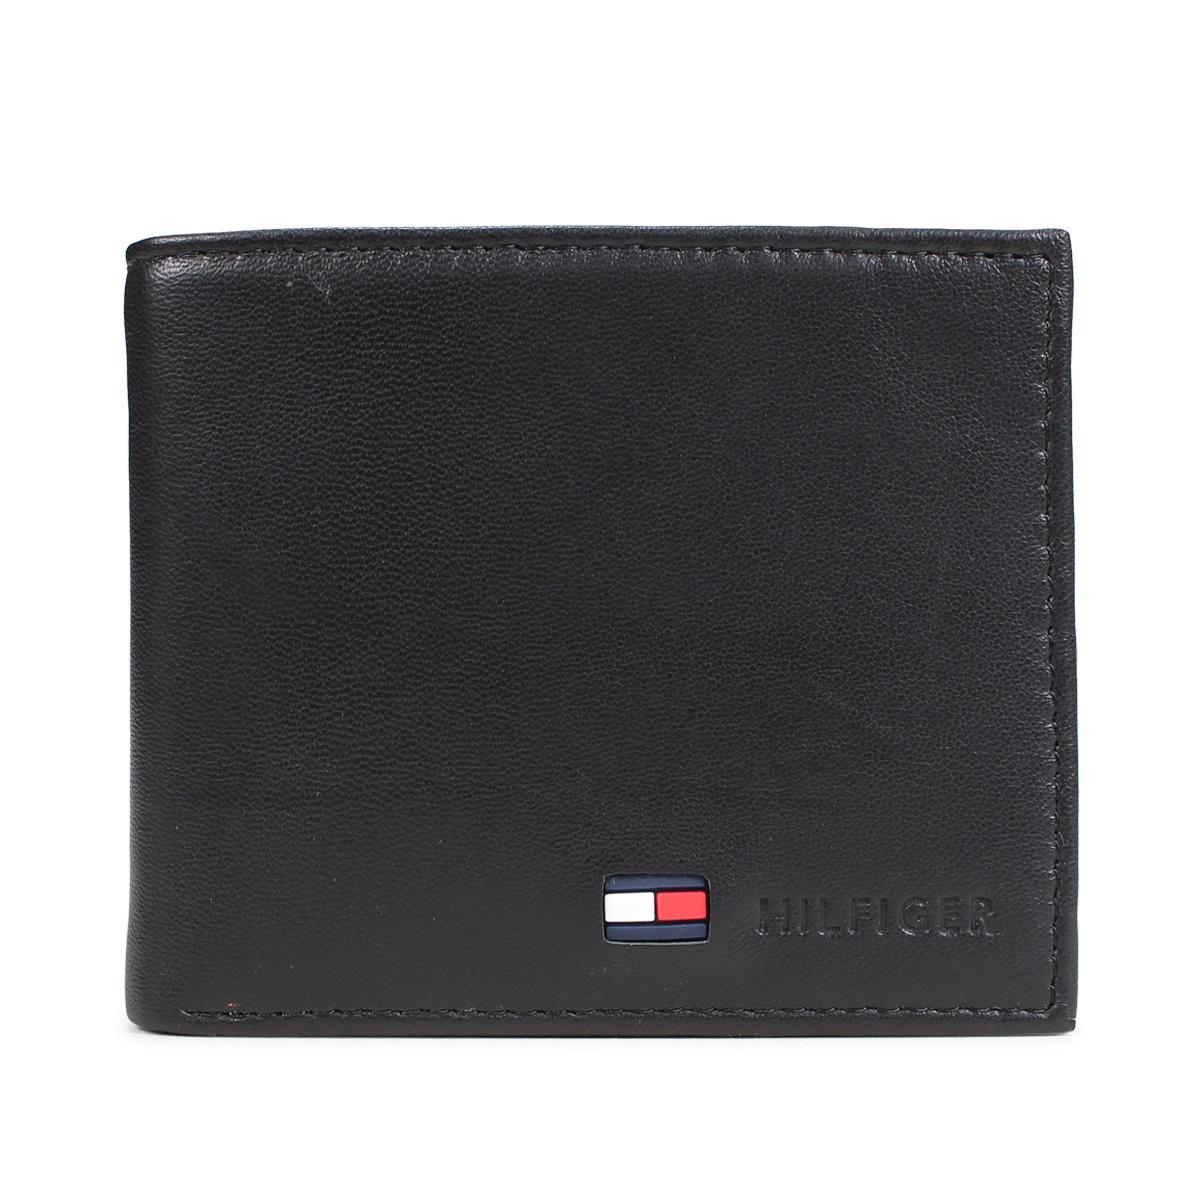 2cbfb54491f TOMMY HILFIGER STOCKTON トミーヒルフィガー wallet folio men leather black  31TL25X020-001 [2/ ...